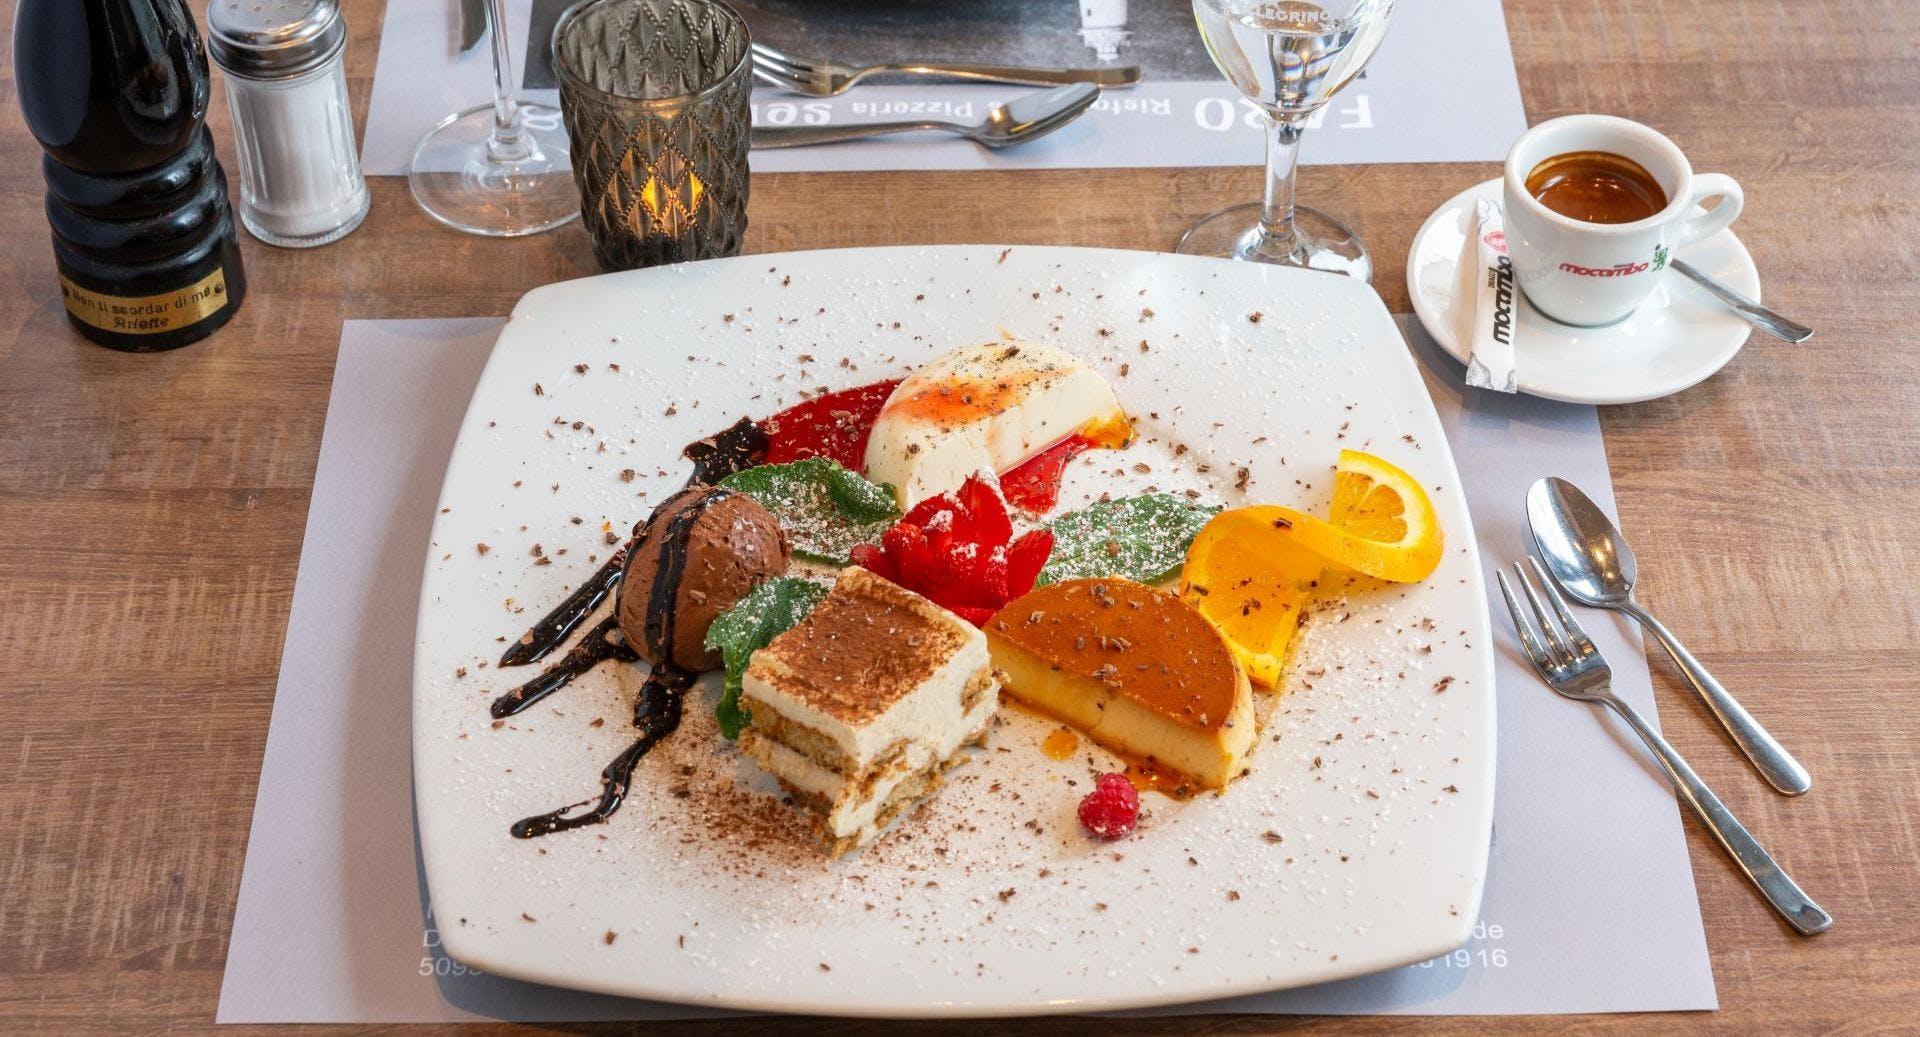 Faro Italienisches Restaurant Cologne image 3